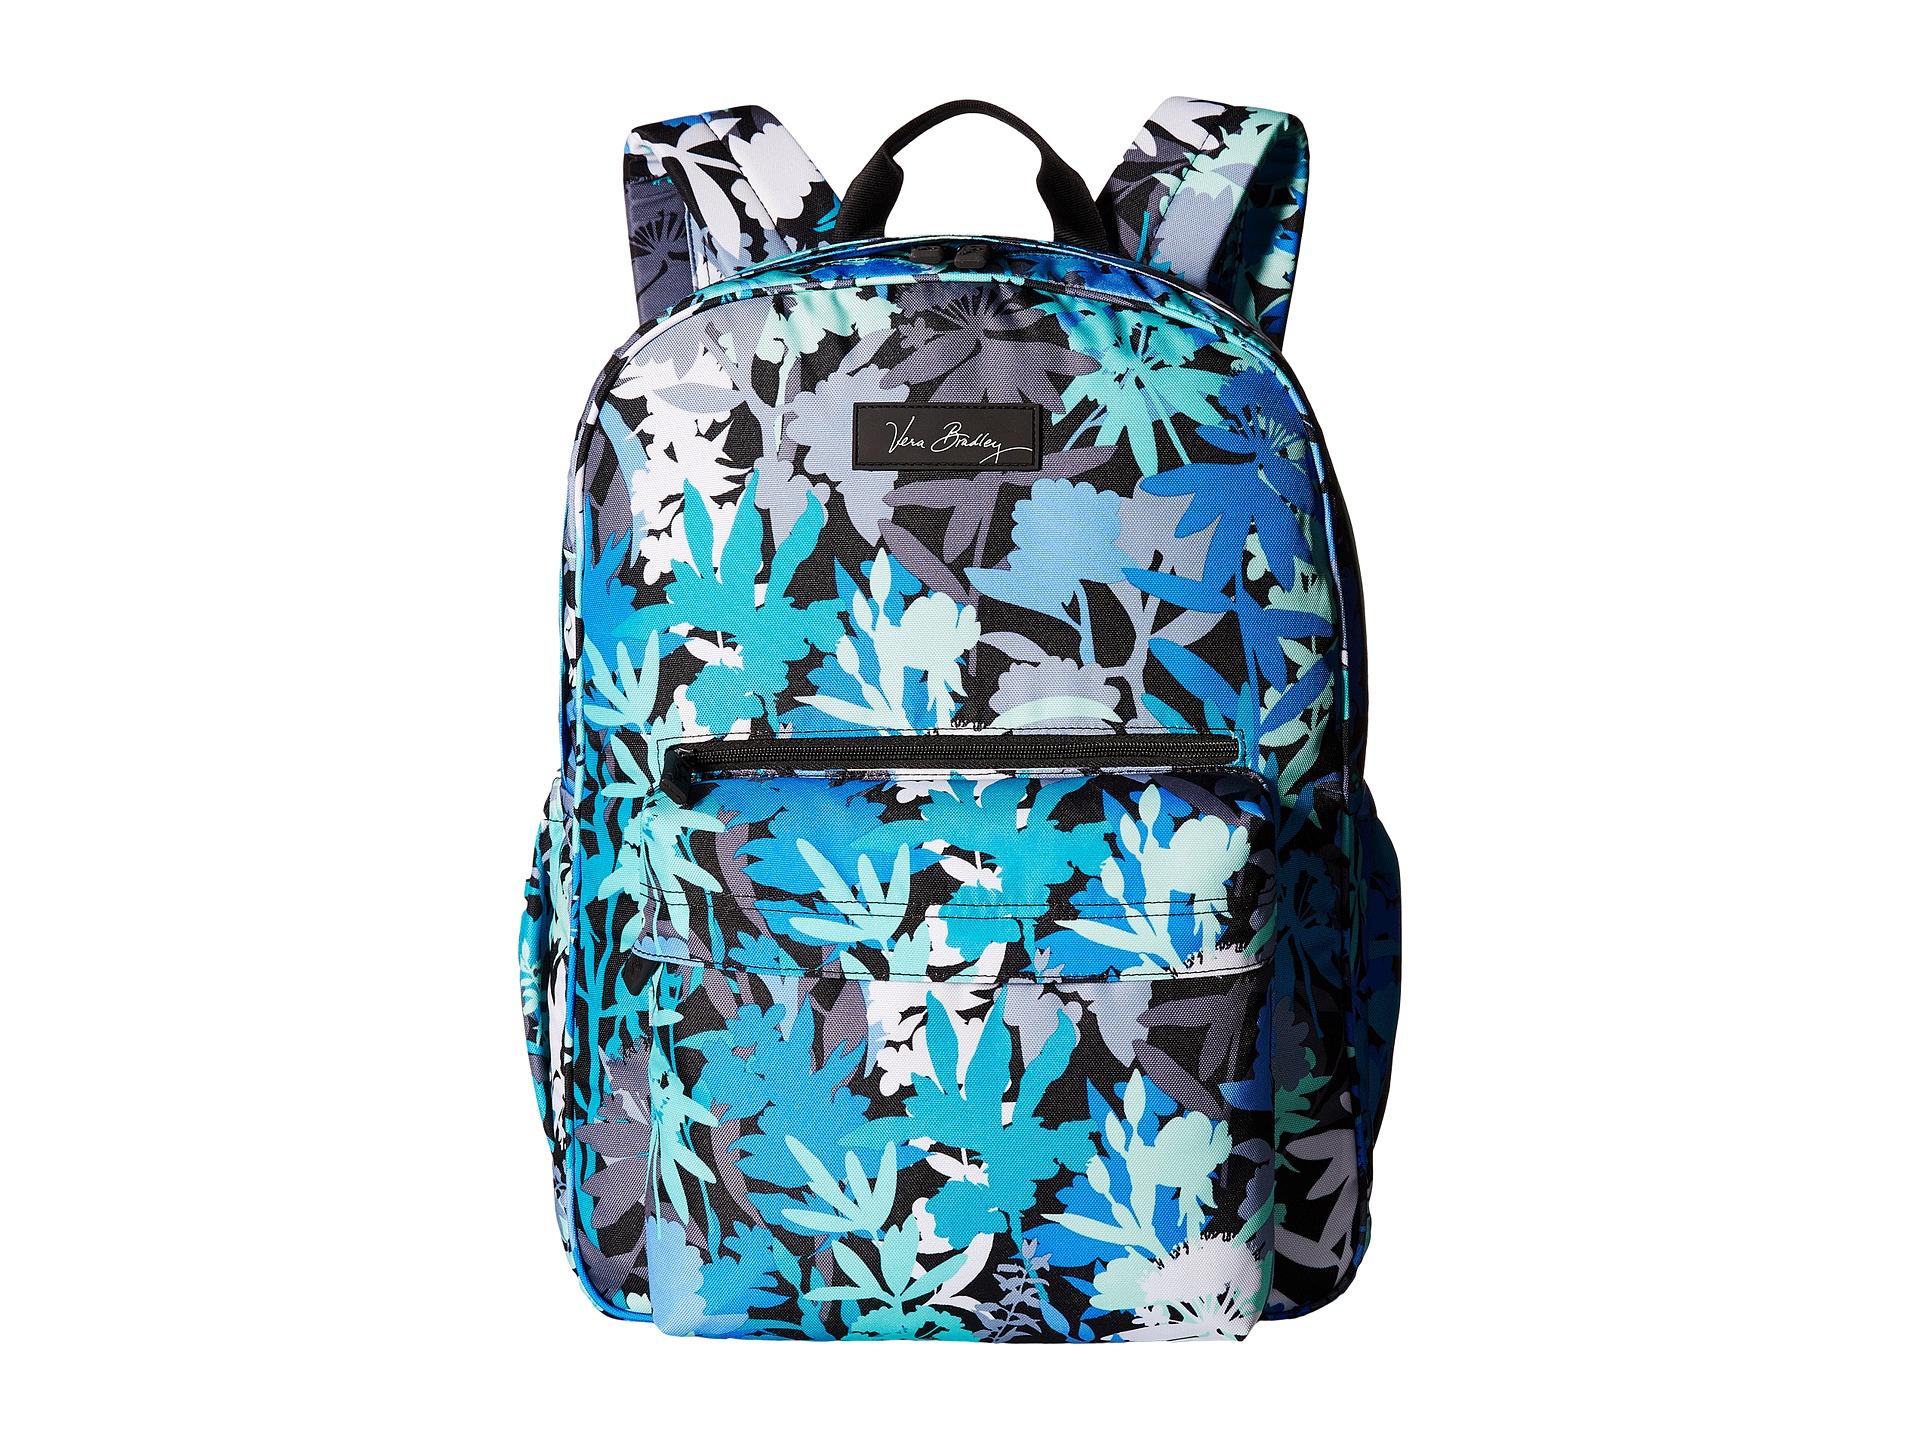 13b600f8cfb0 Vera Bradley Flower Shower Laptop Backpack - Flowers Healthy